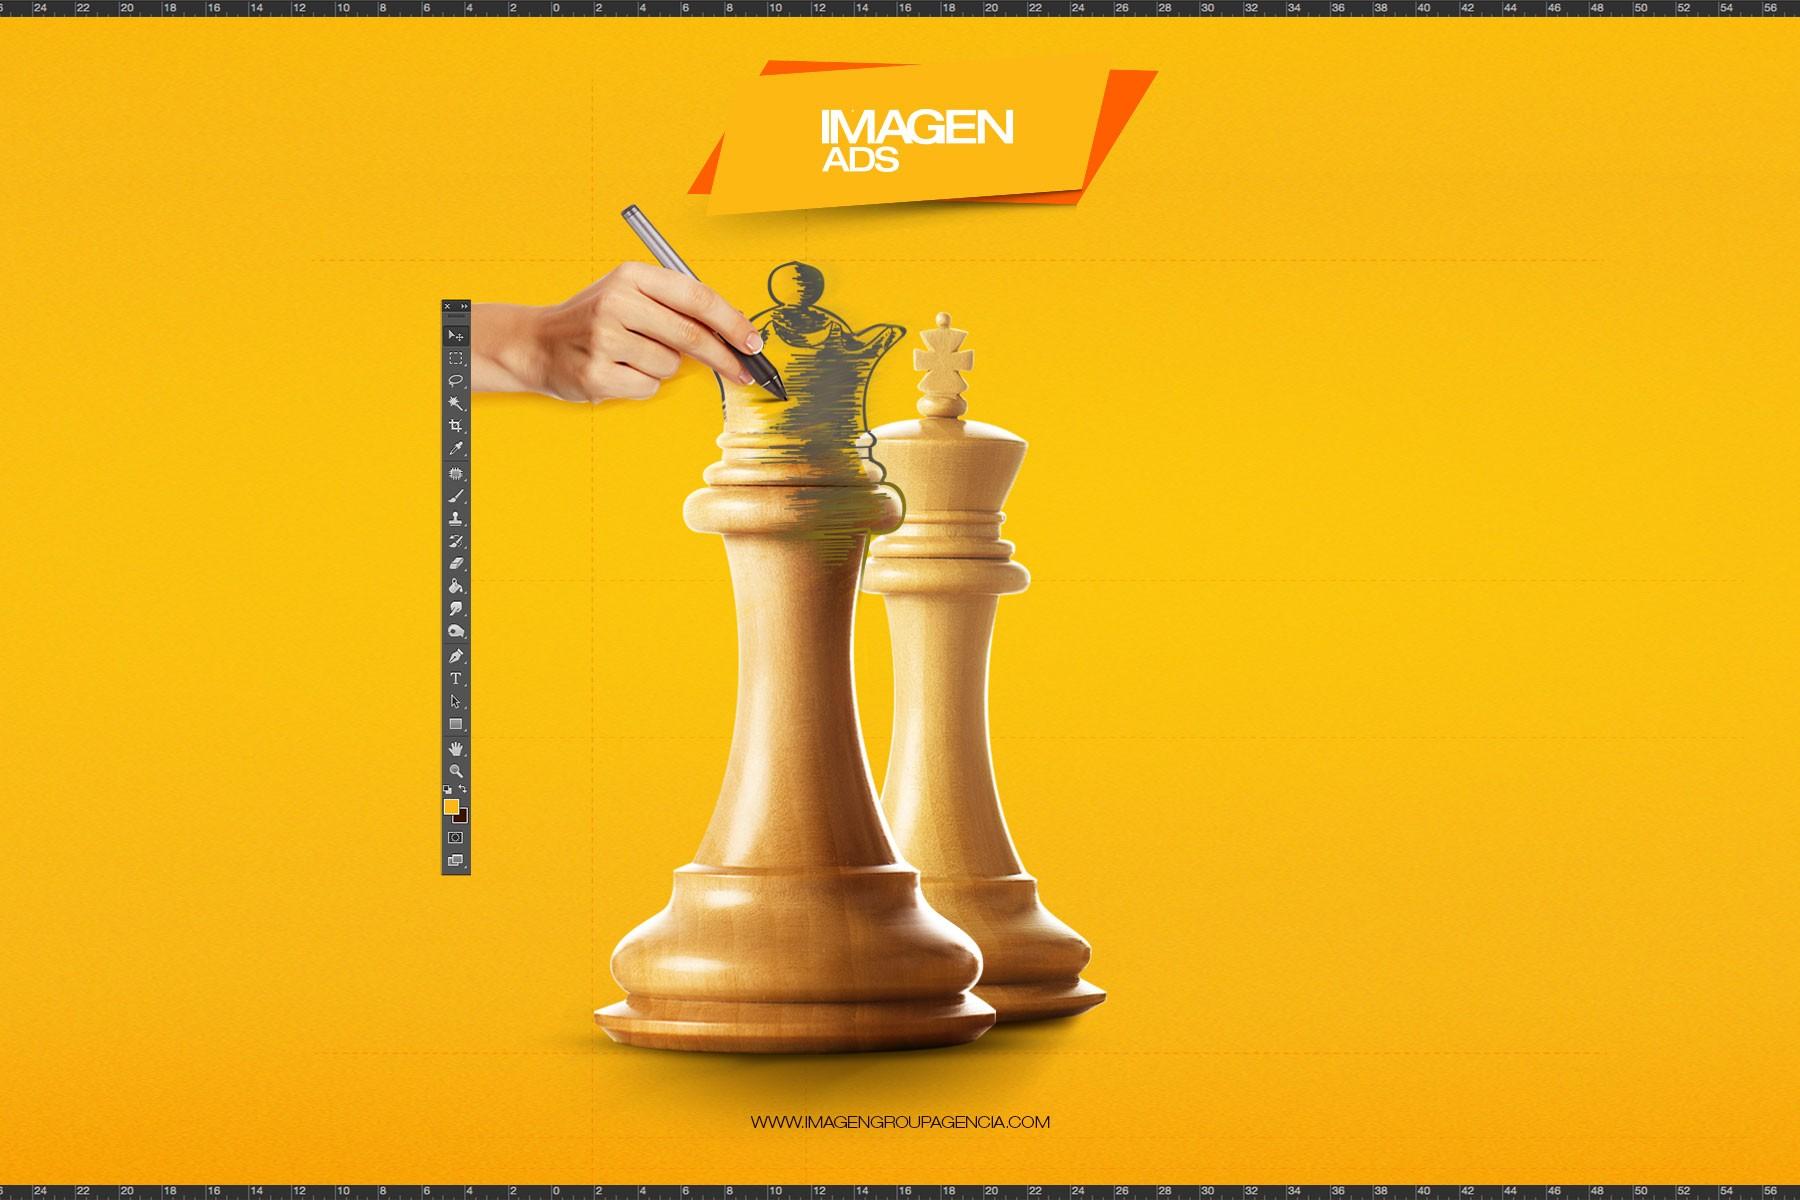 Imagen ADS